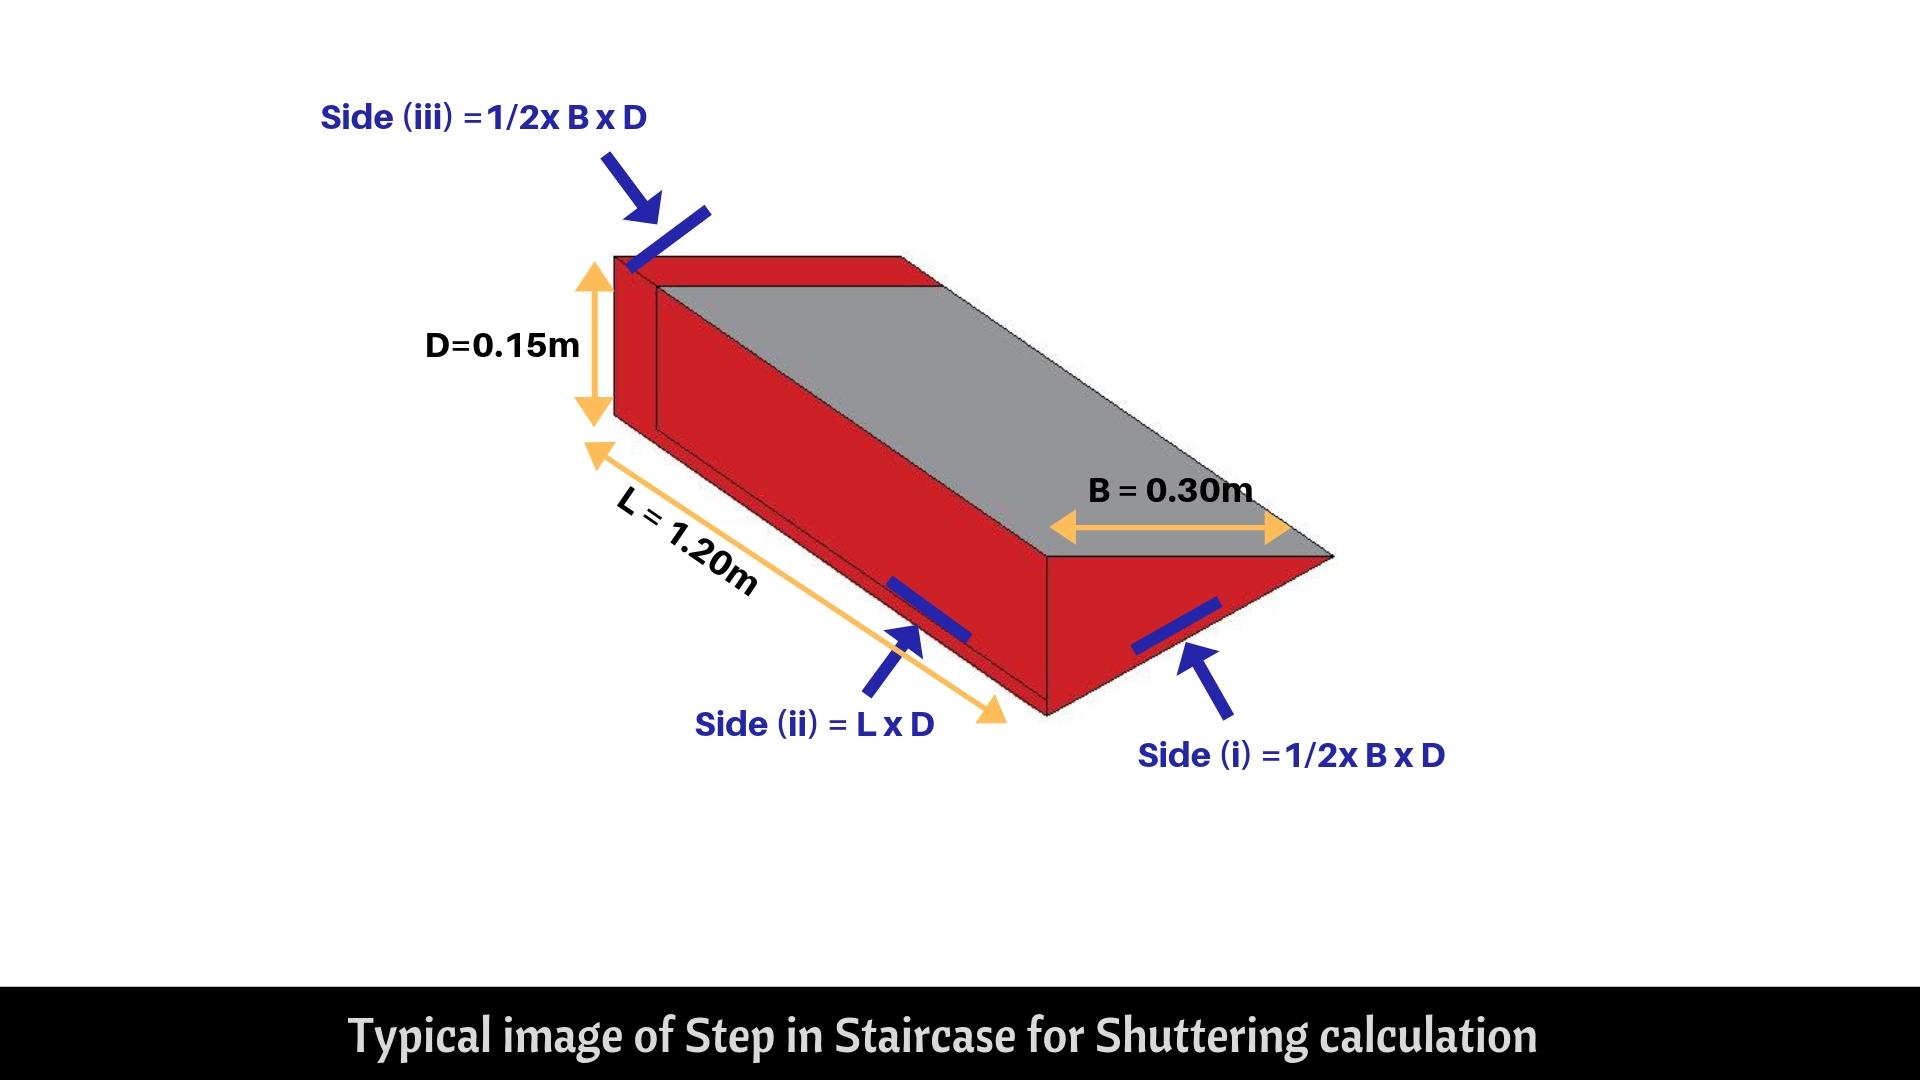 Step Shuttering area